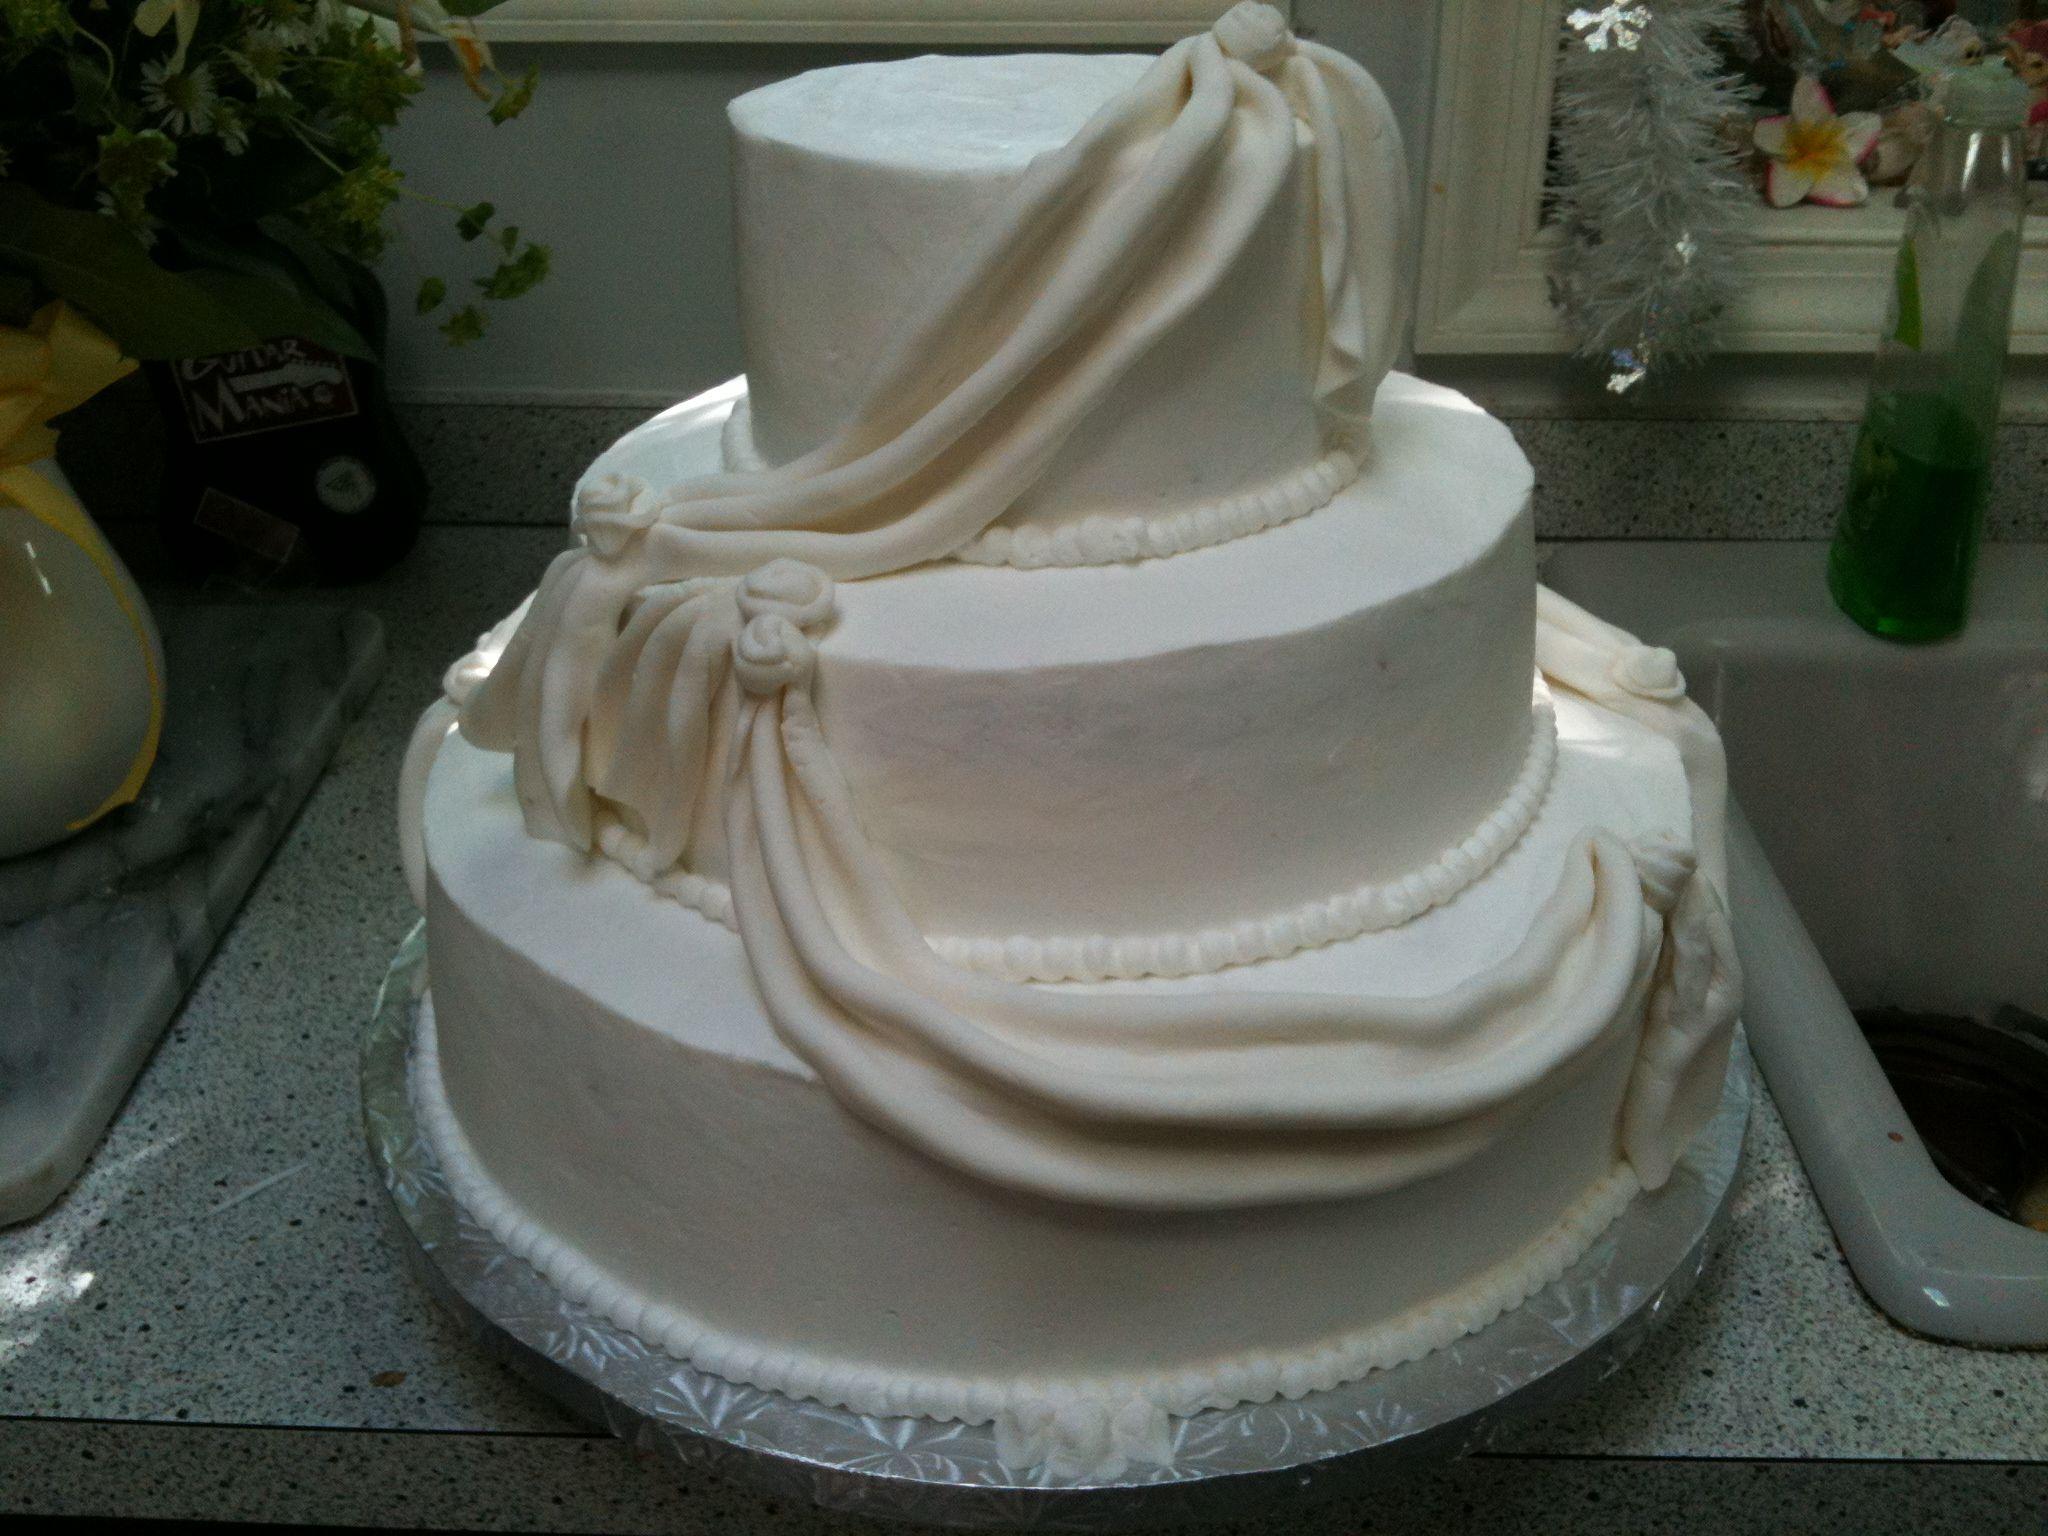 Cake Design Ulm : Fondant Swag Sash across simple 3 tier #wedding #cake. www ...